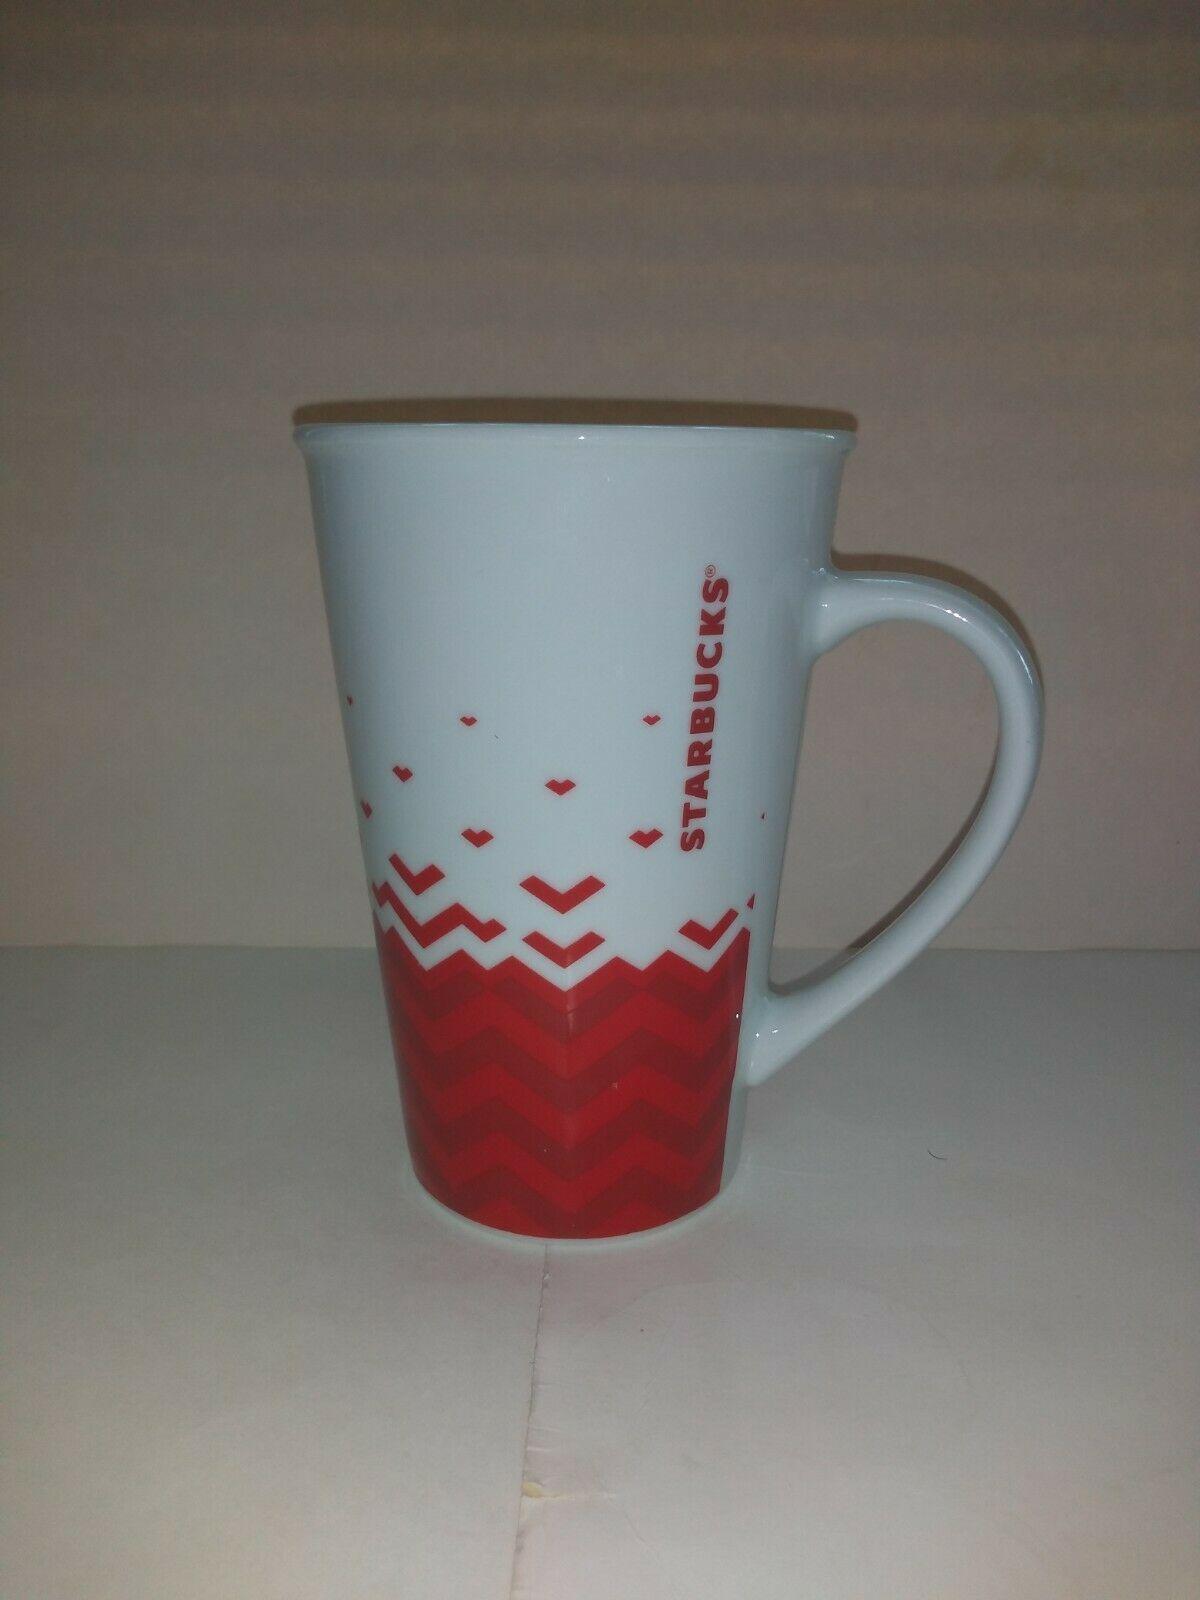 Starbucks 2013 Red White Hearts Valentines Day Mug 22 OZ  image 6